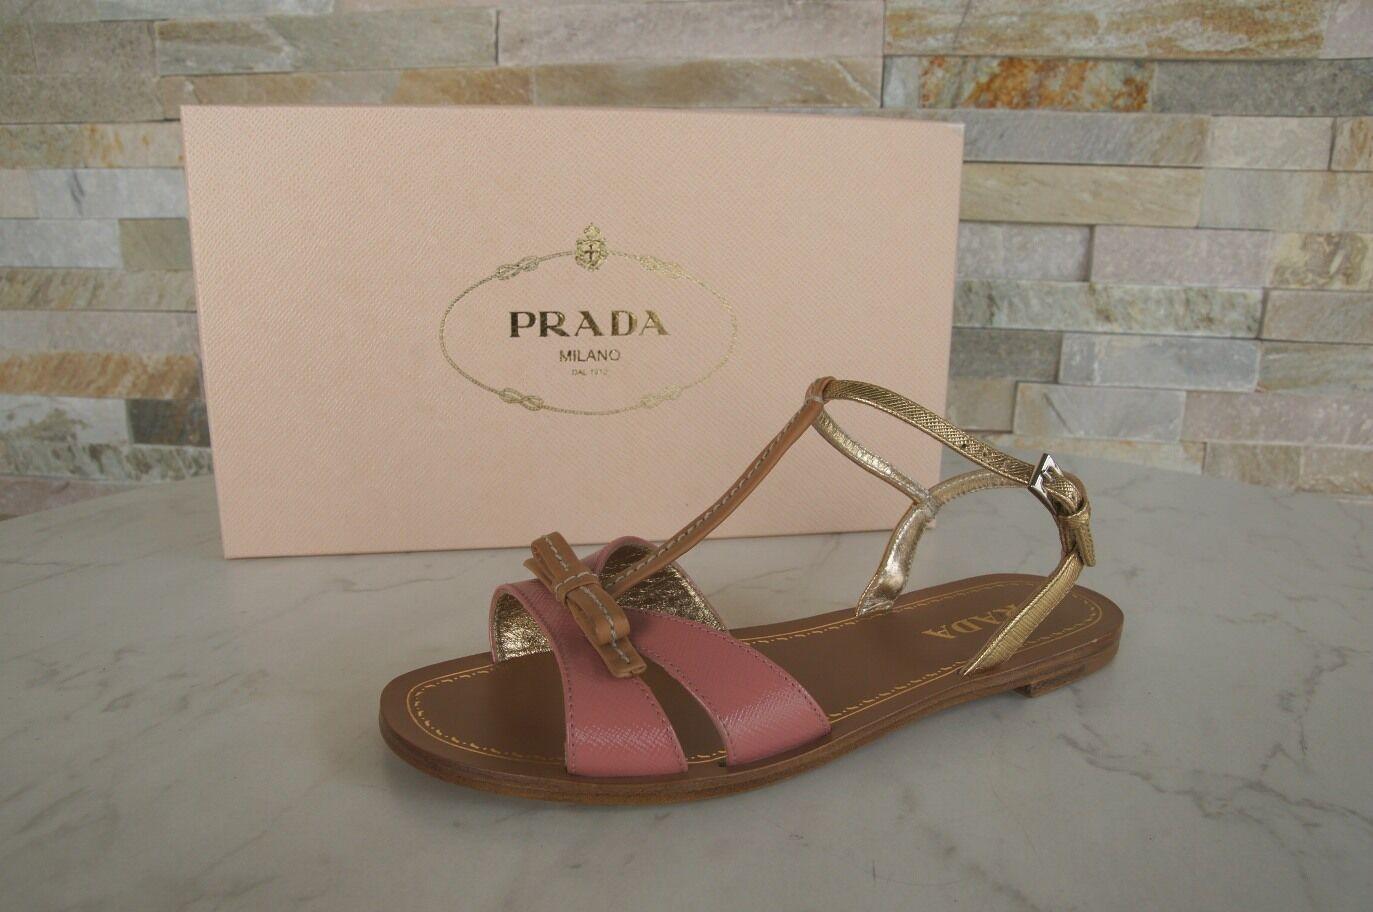 PRADA Gr 36 T-Strap Sandalen Sandales braun Schuhe schuhe rosa + braun Sandales NEU 2ac357